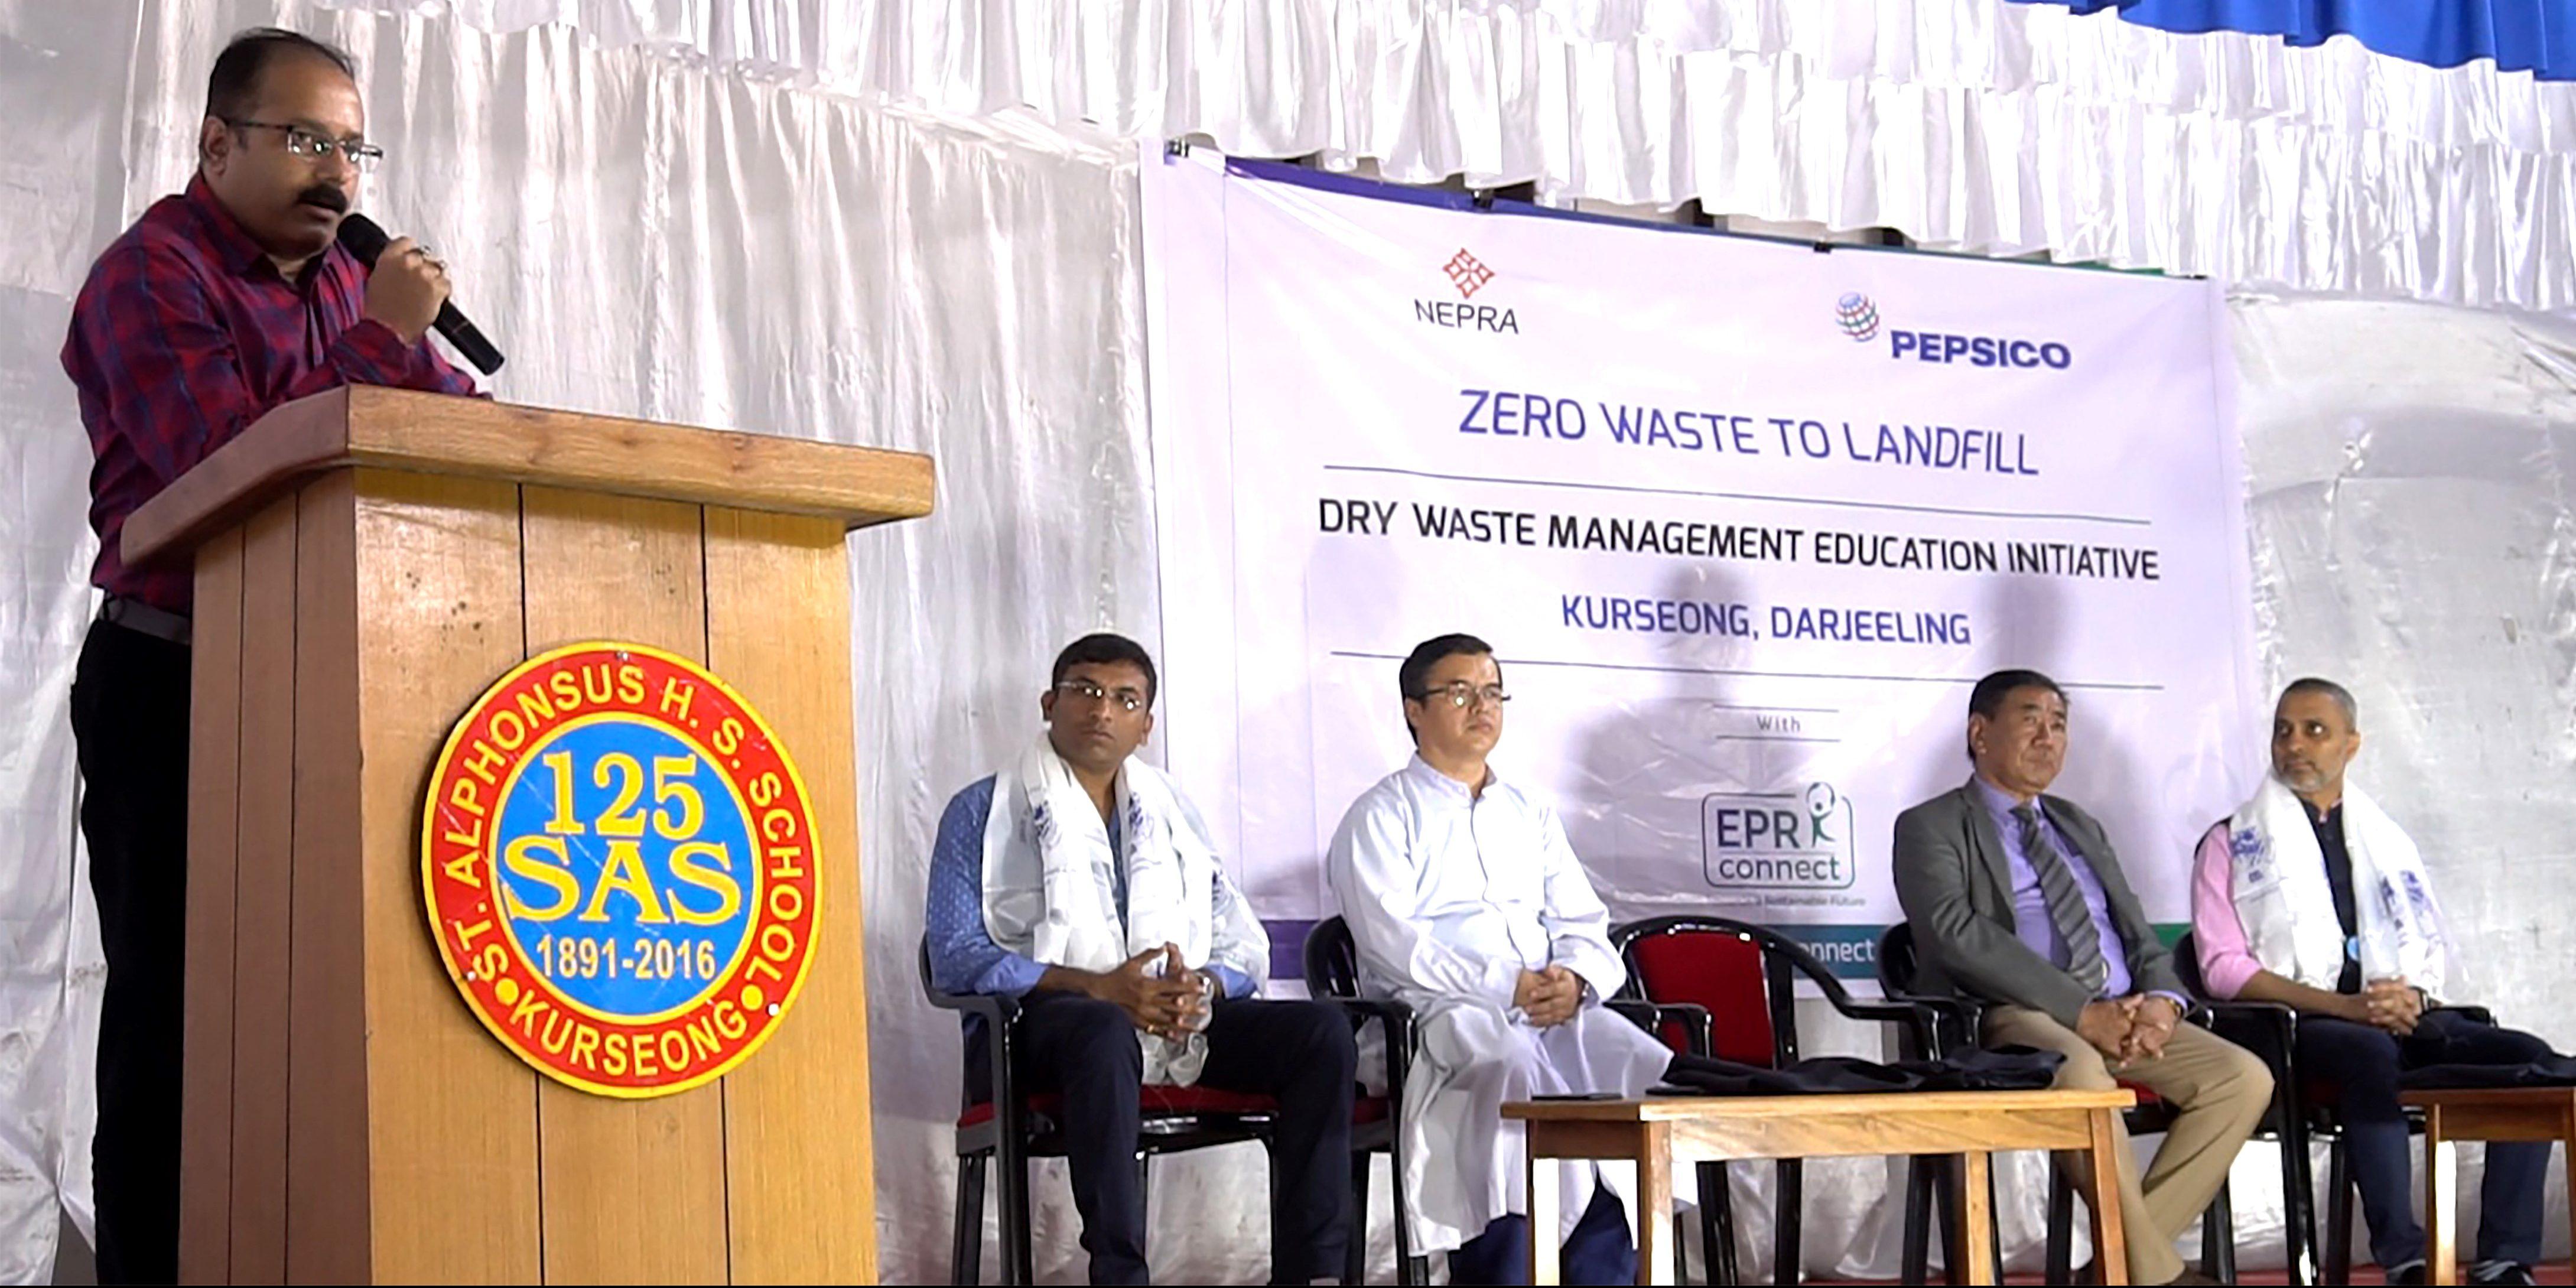 PepsiCo India and Nepra Launches Plastic Waste Management